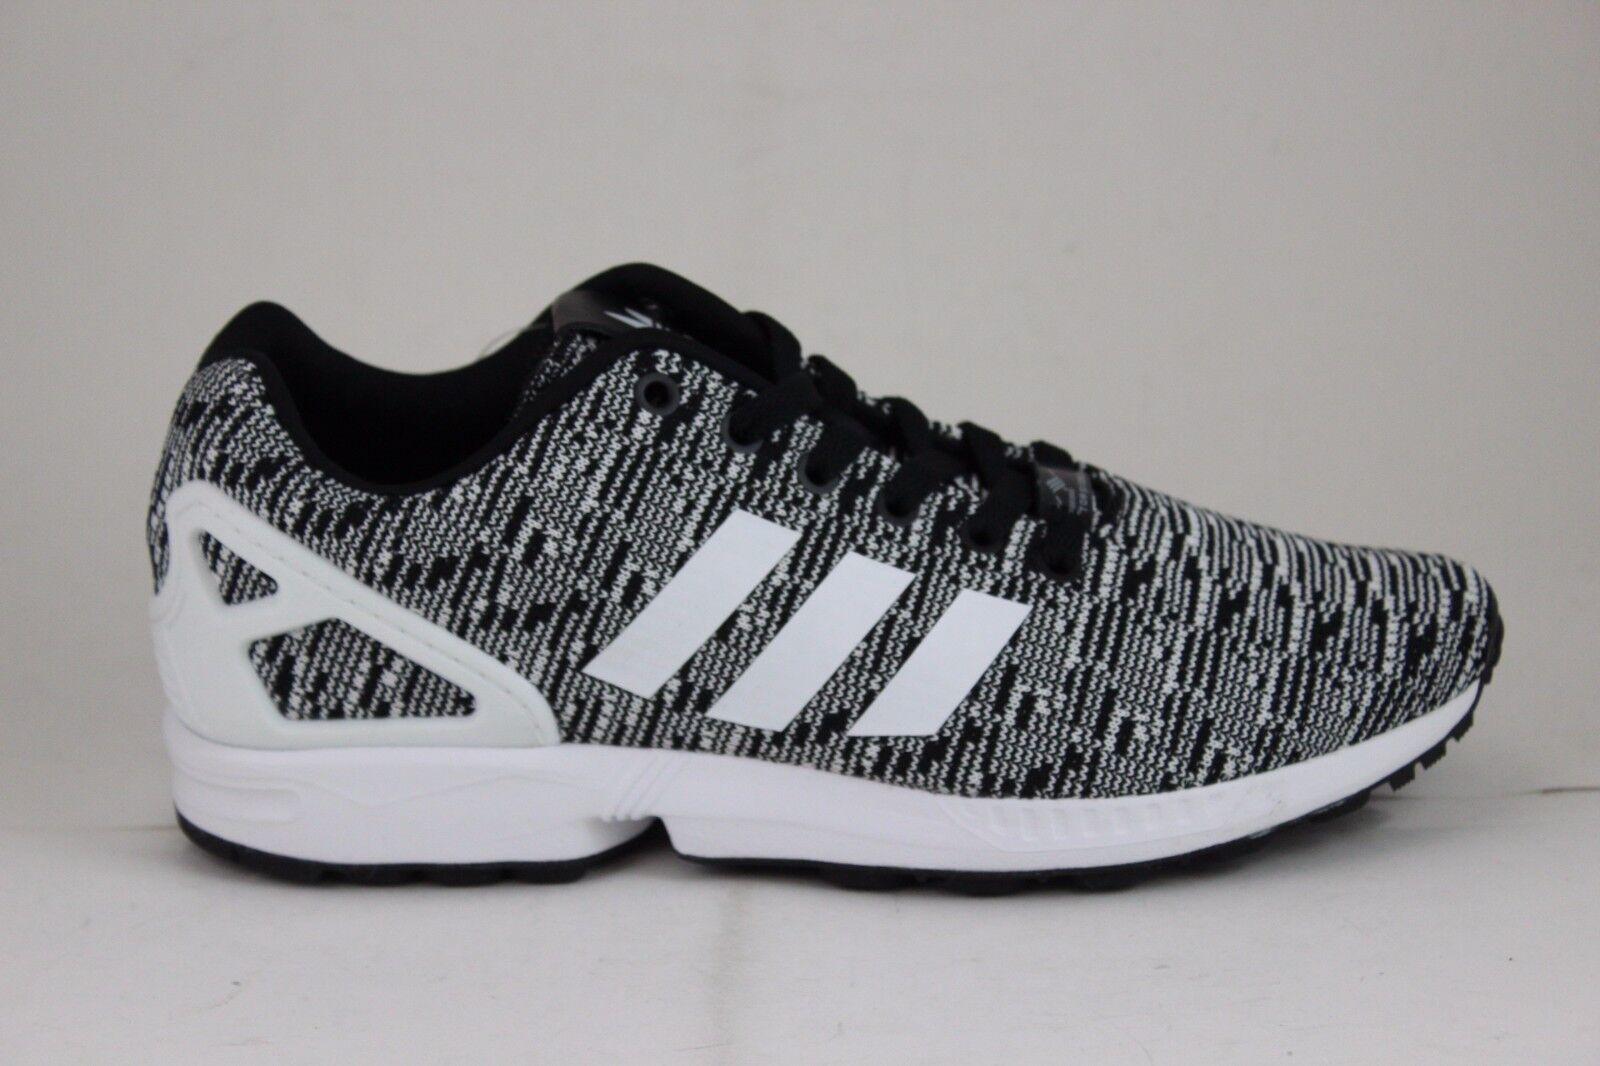 Adidas ZX Flux Black White White BB2166 Brand New in Box